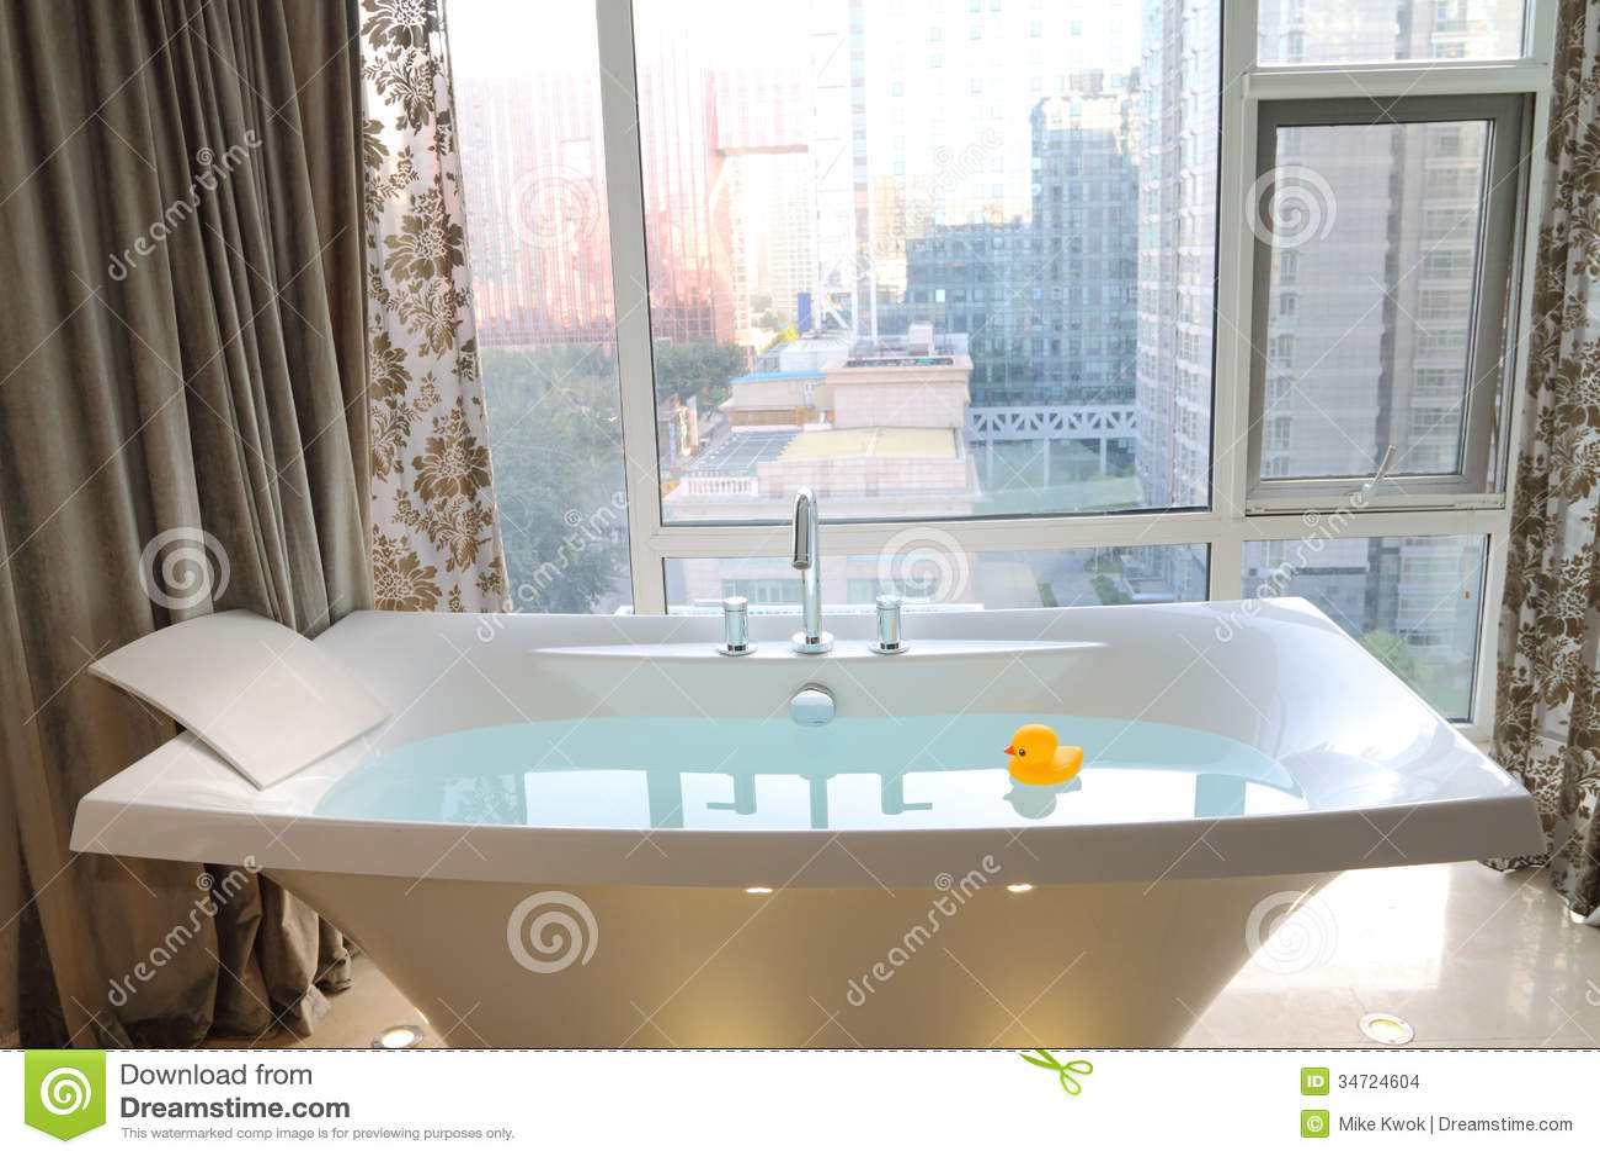 Bathtub stock photo. Image of ceramic, bathtub, duck - 34724604